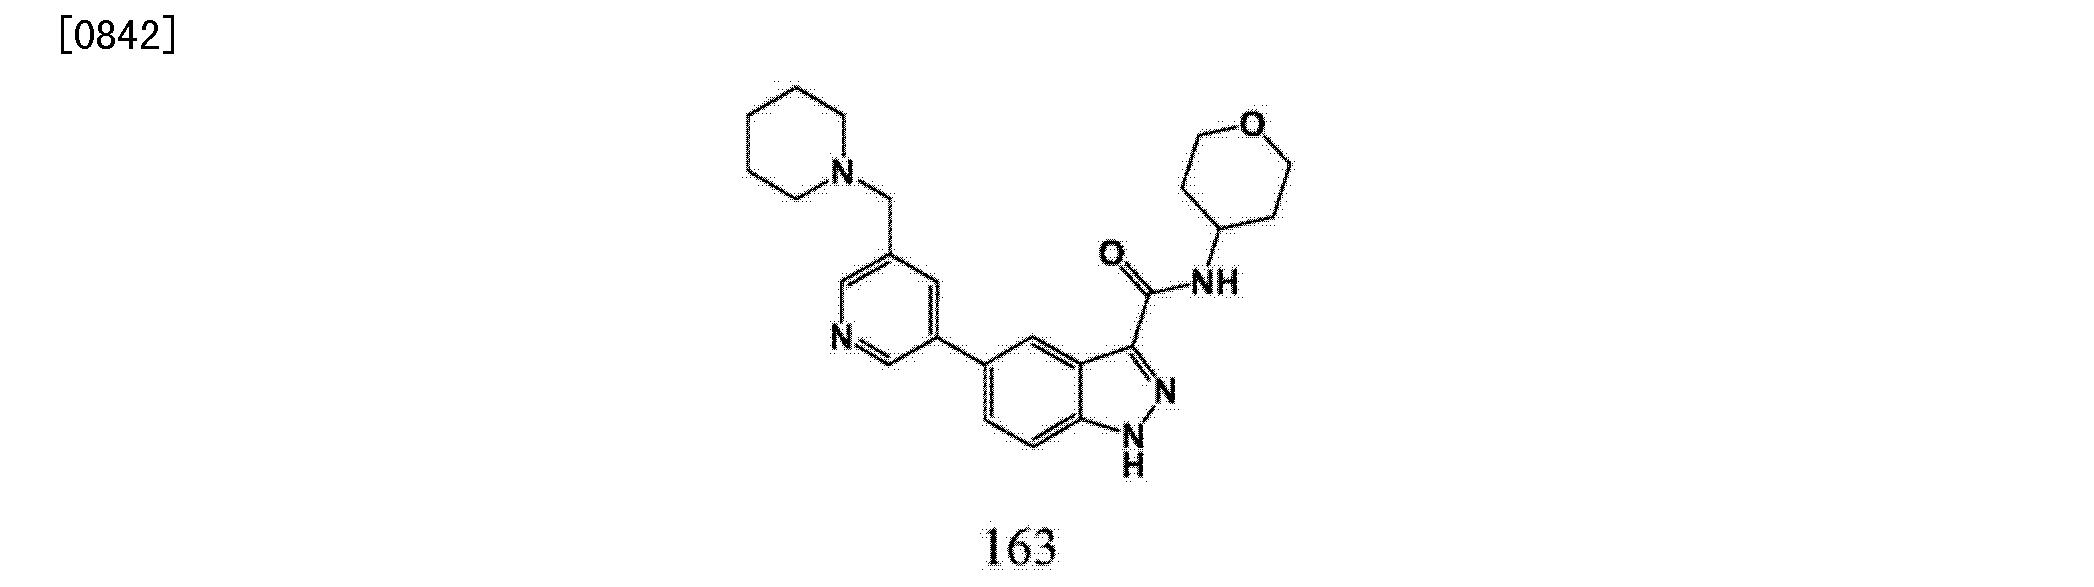 Figure CN103929963AD02002